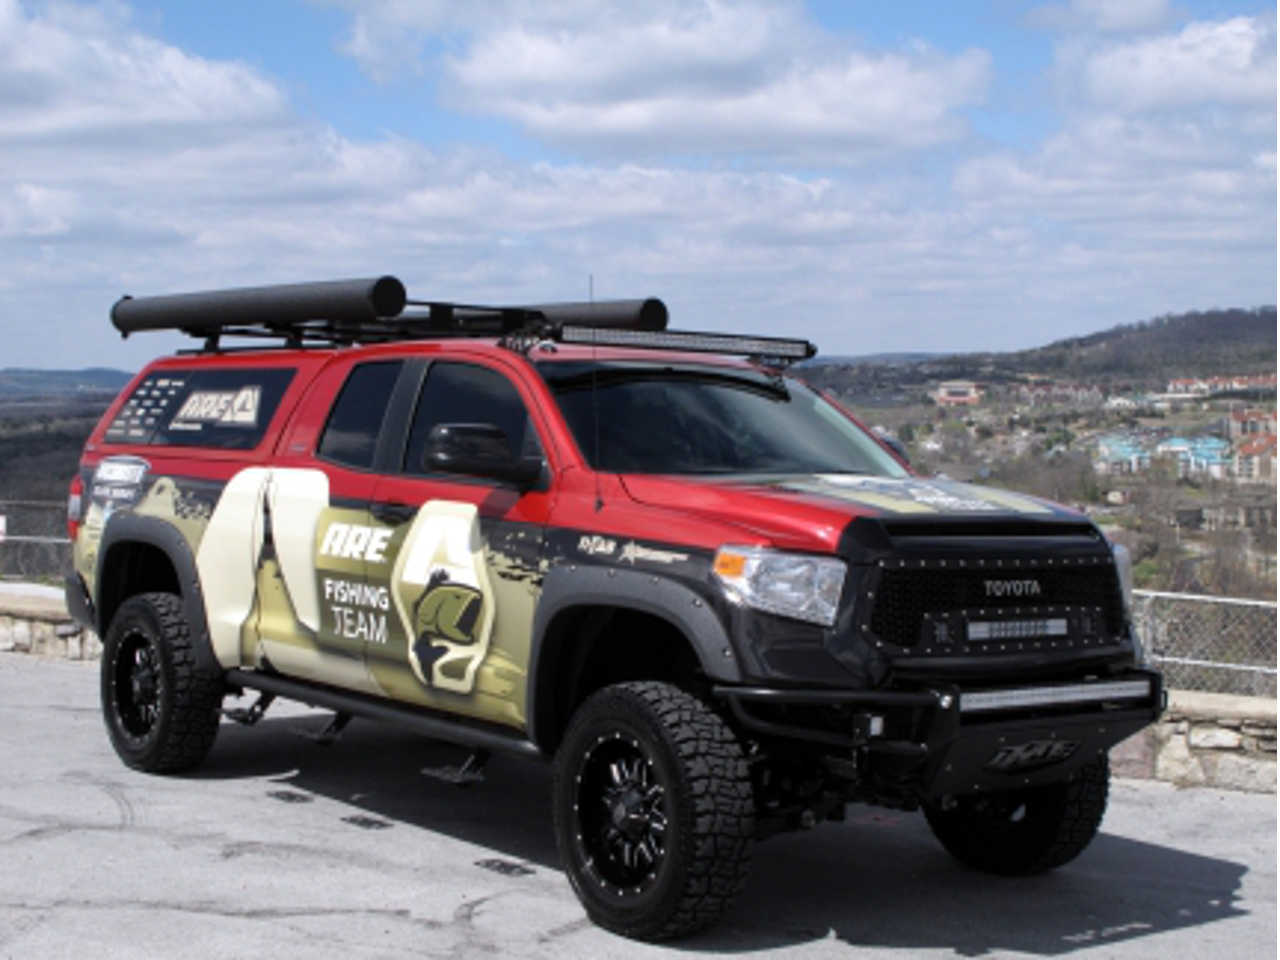 A R E 2014 Fishing Team Tundra Project Truck Showcases